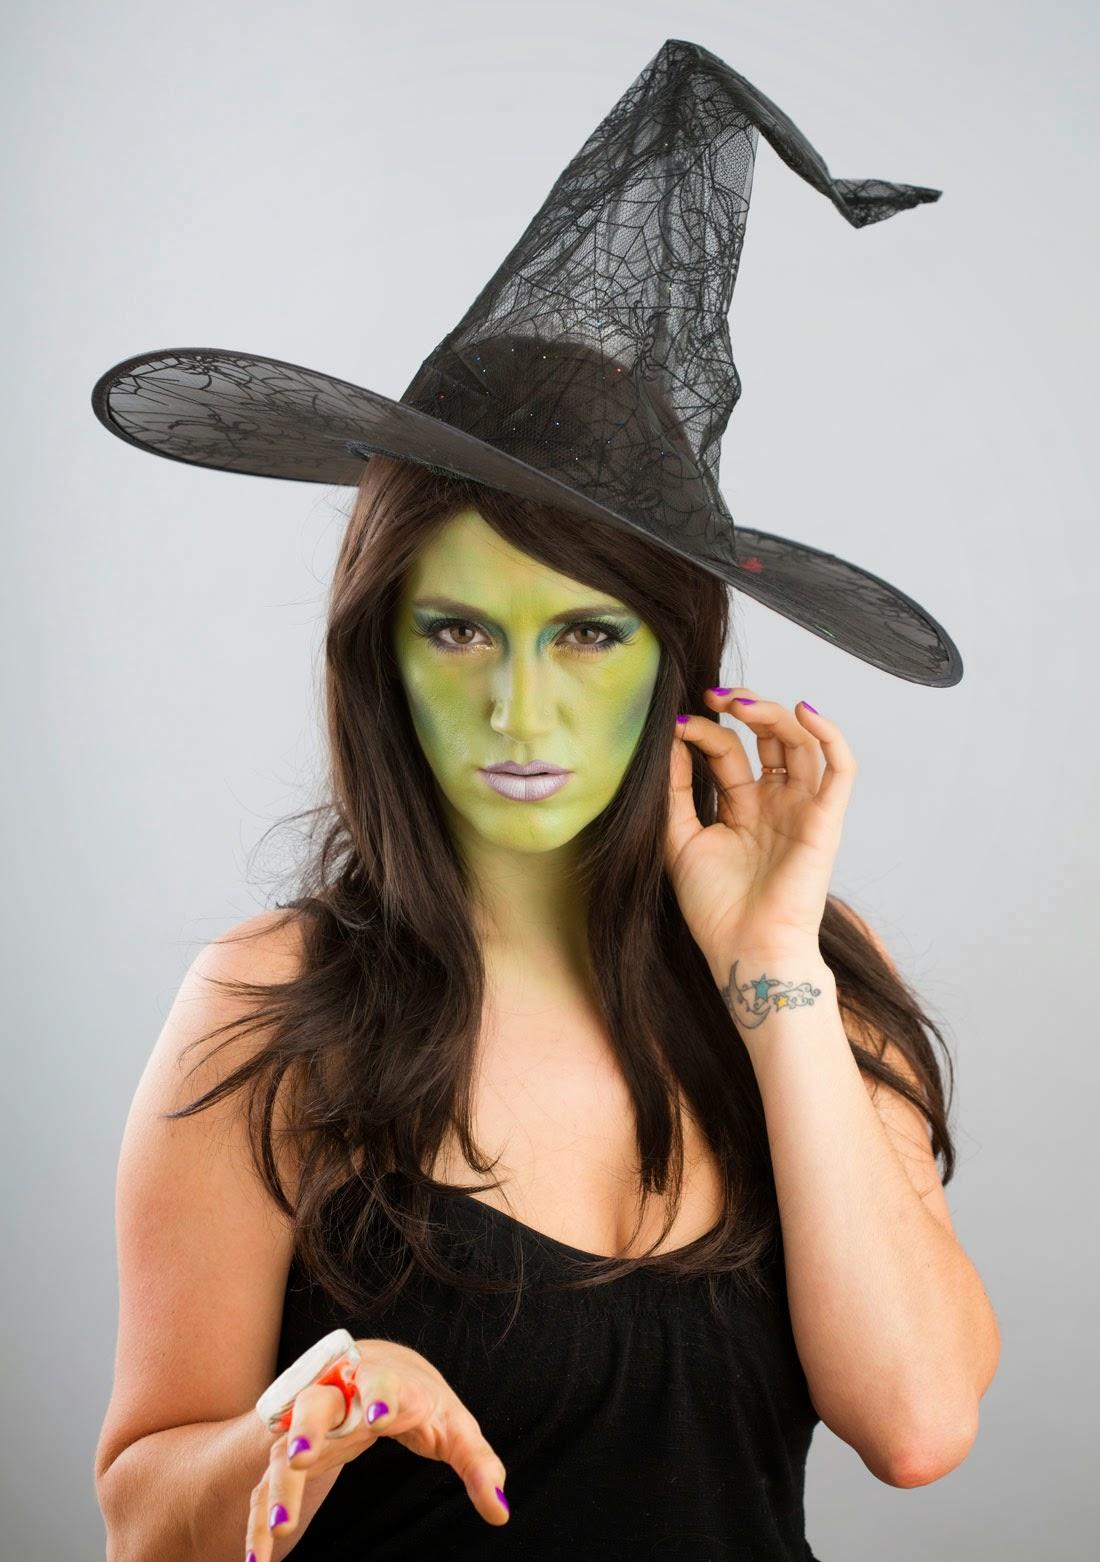 Muyvariadocom Caras Pintadas Maquillaje De Halloween Diseno Bruja - Cara-pintada-para-halloween